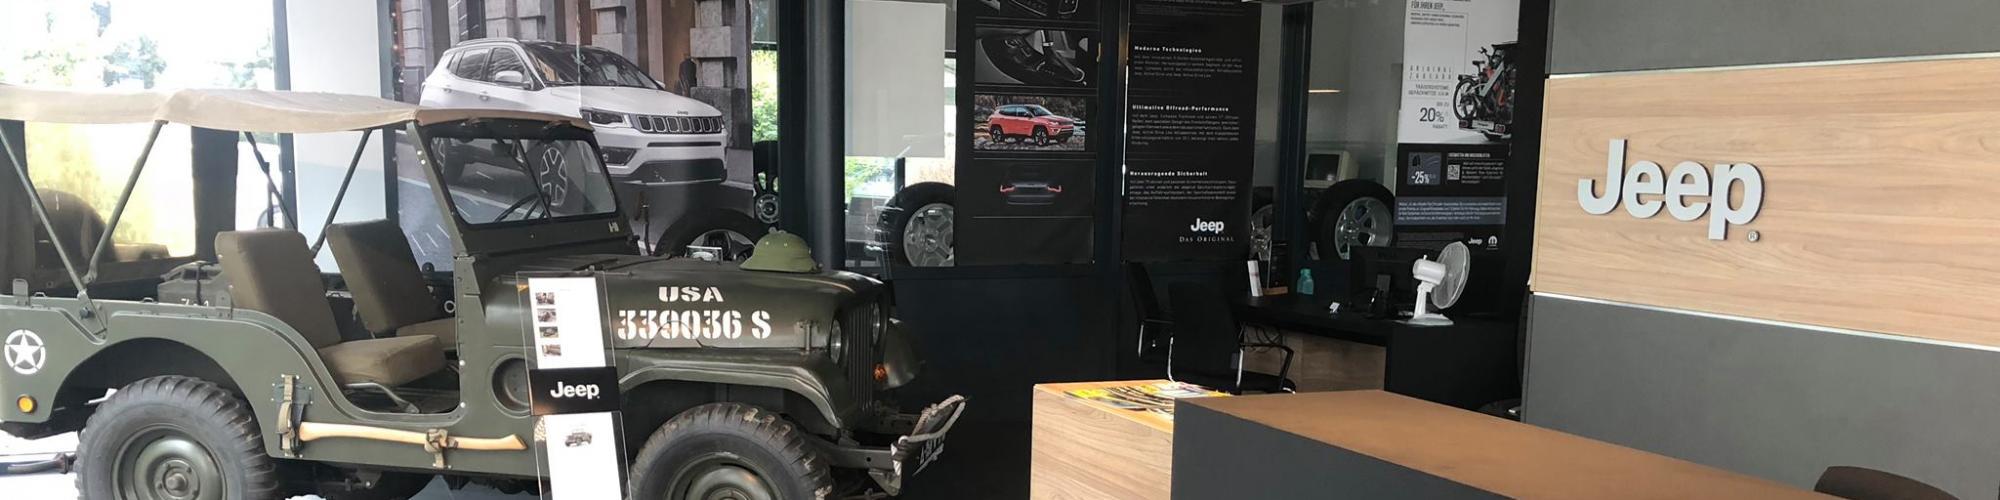 Schautberger Automobile e.K.